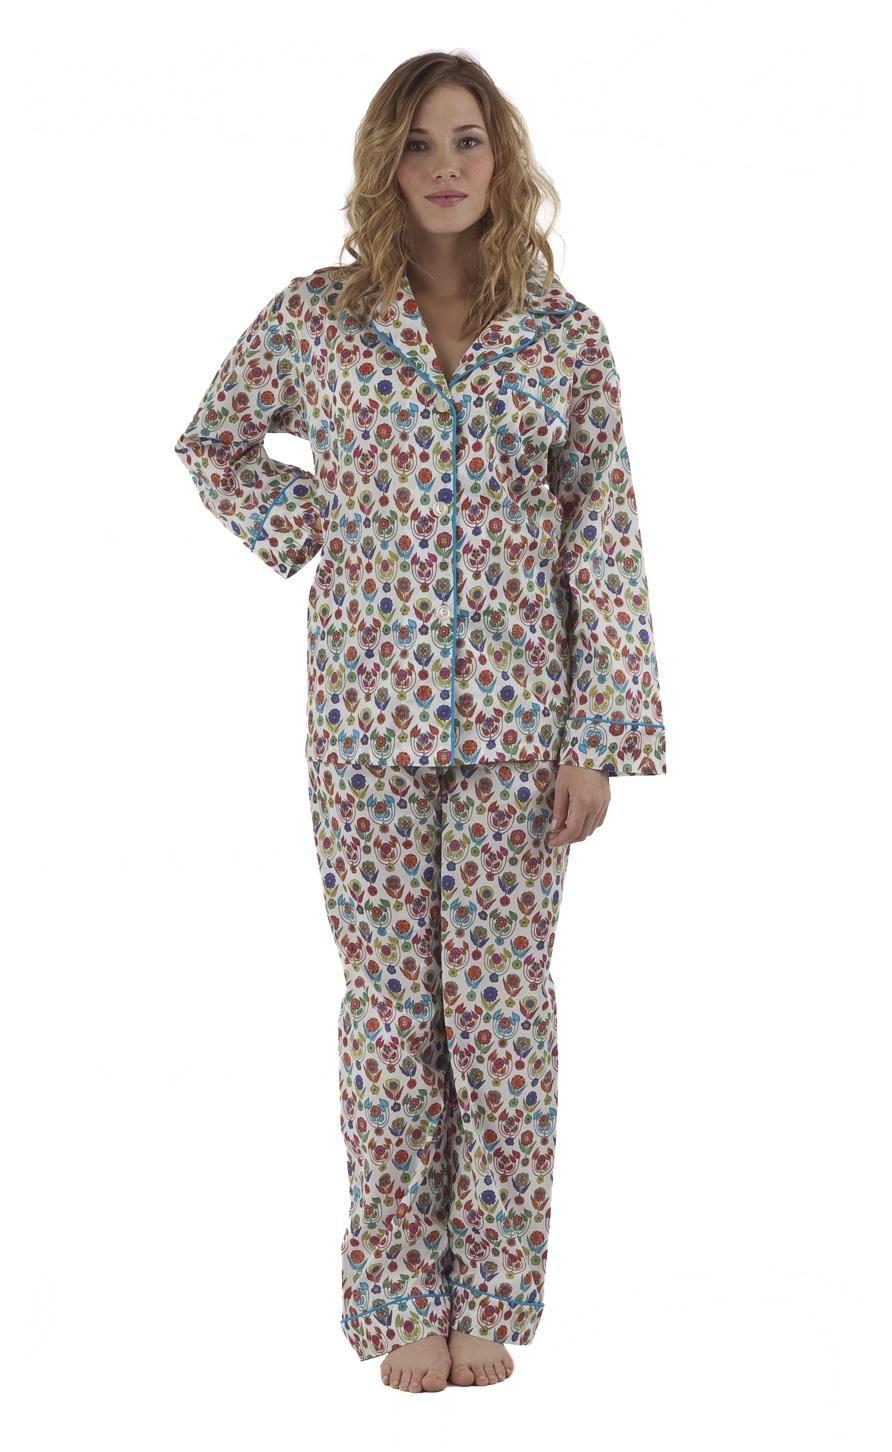 Pajama Shirt Sleepwear Women Night Dress for Winter  36bac7aea